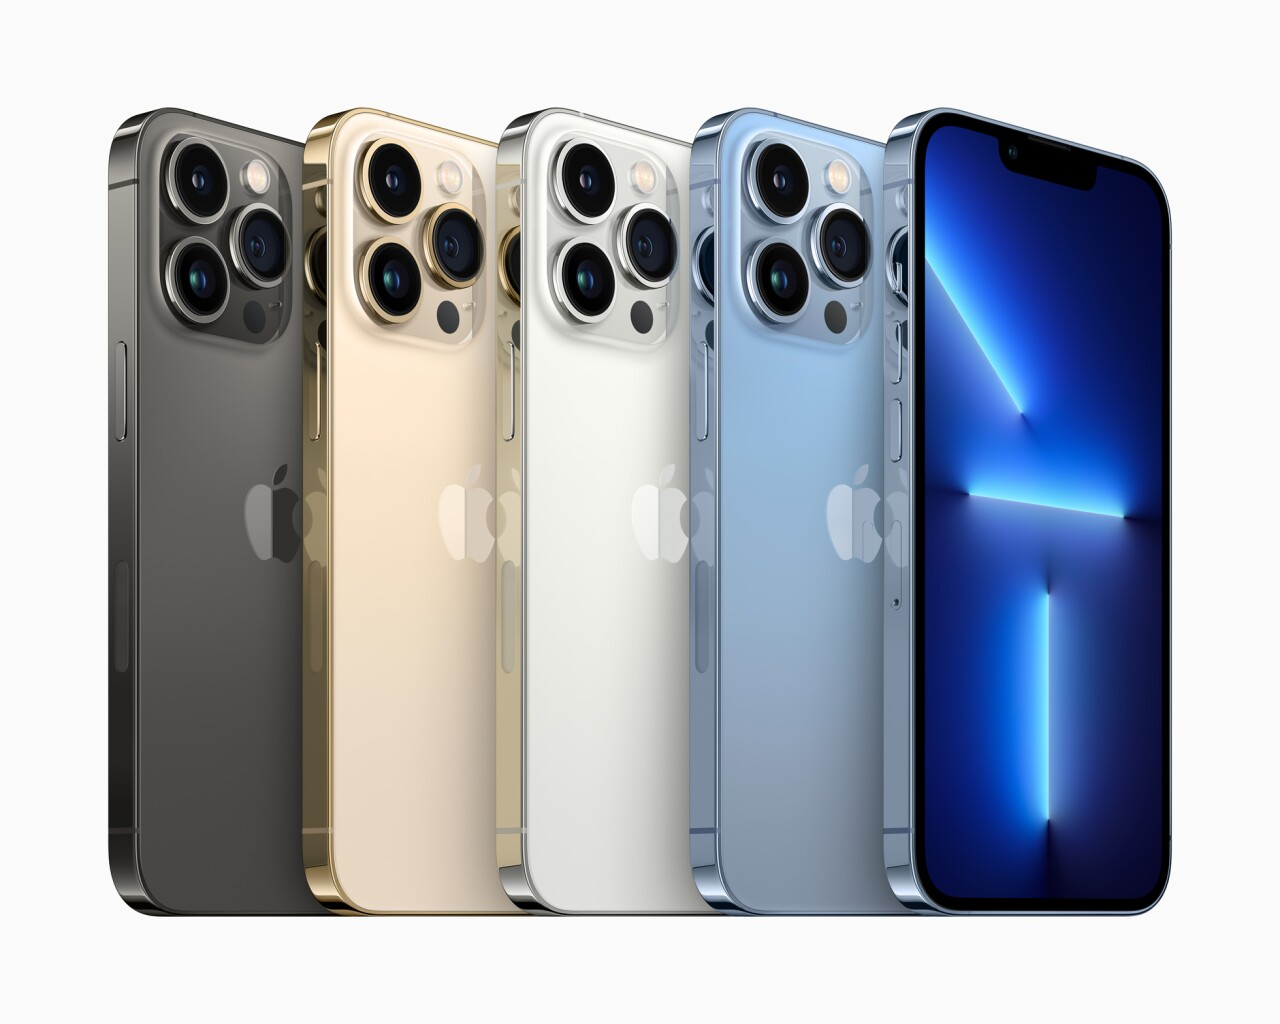 Apple_iPhone-13-Pro_Colors_09142021.jpg